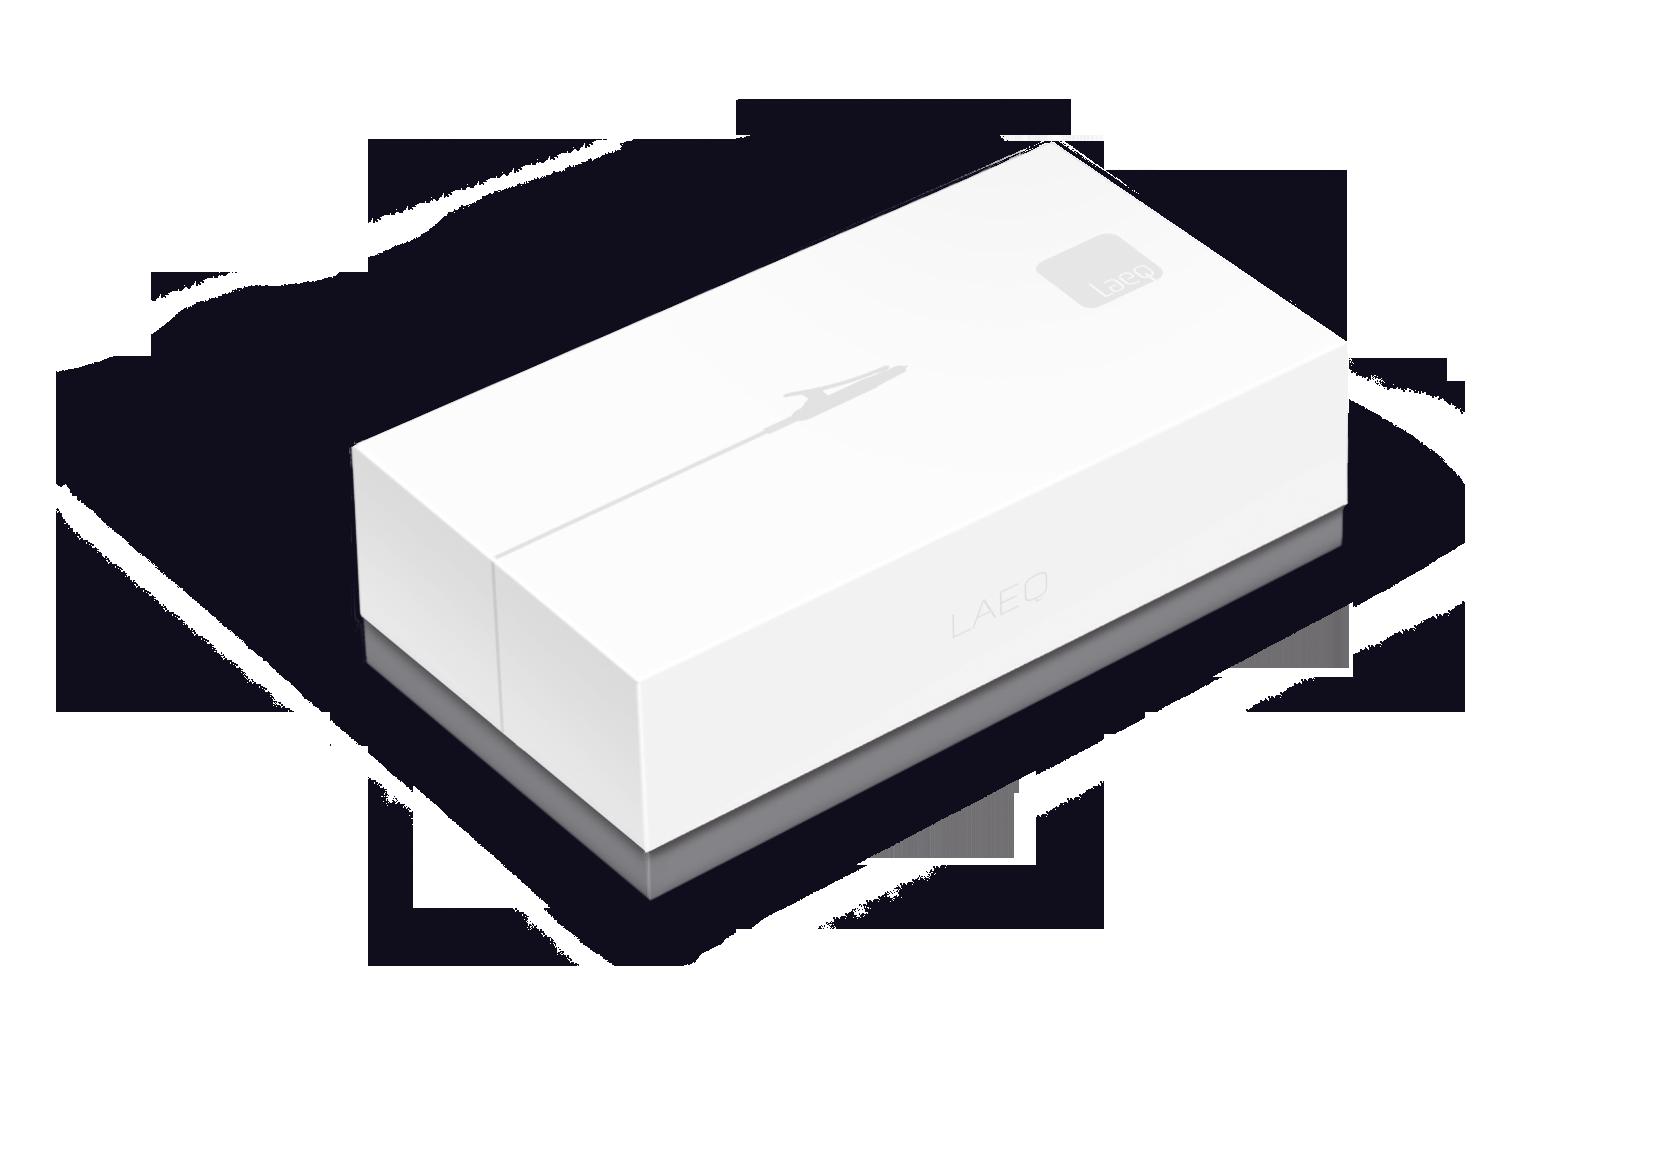 BOX_LAEQ_3